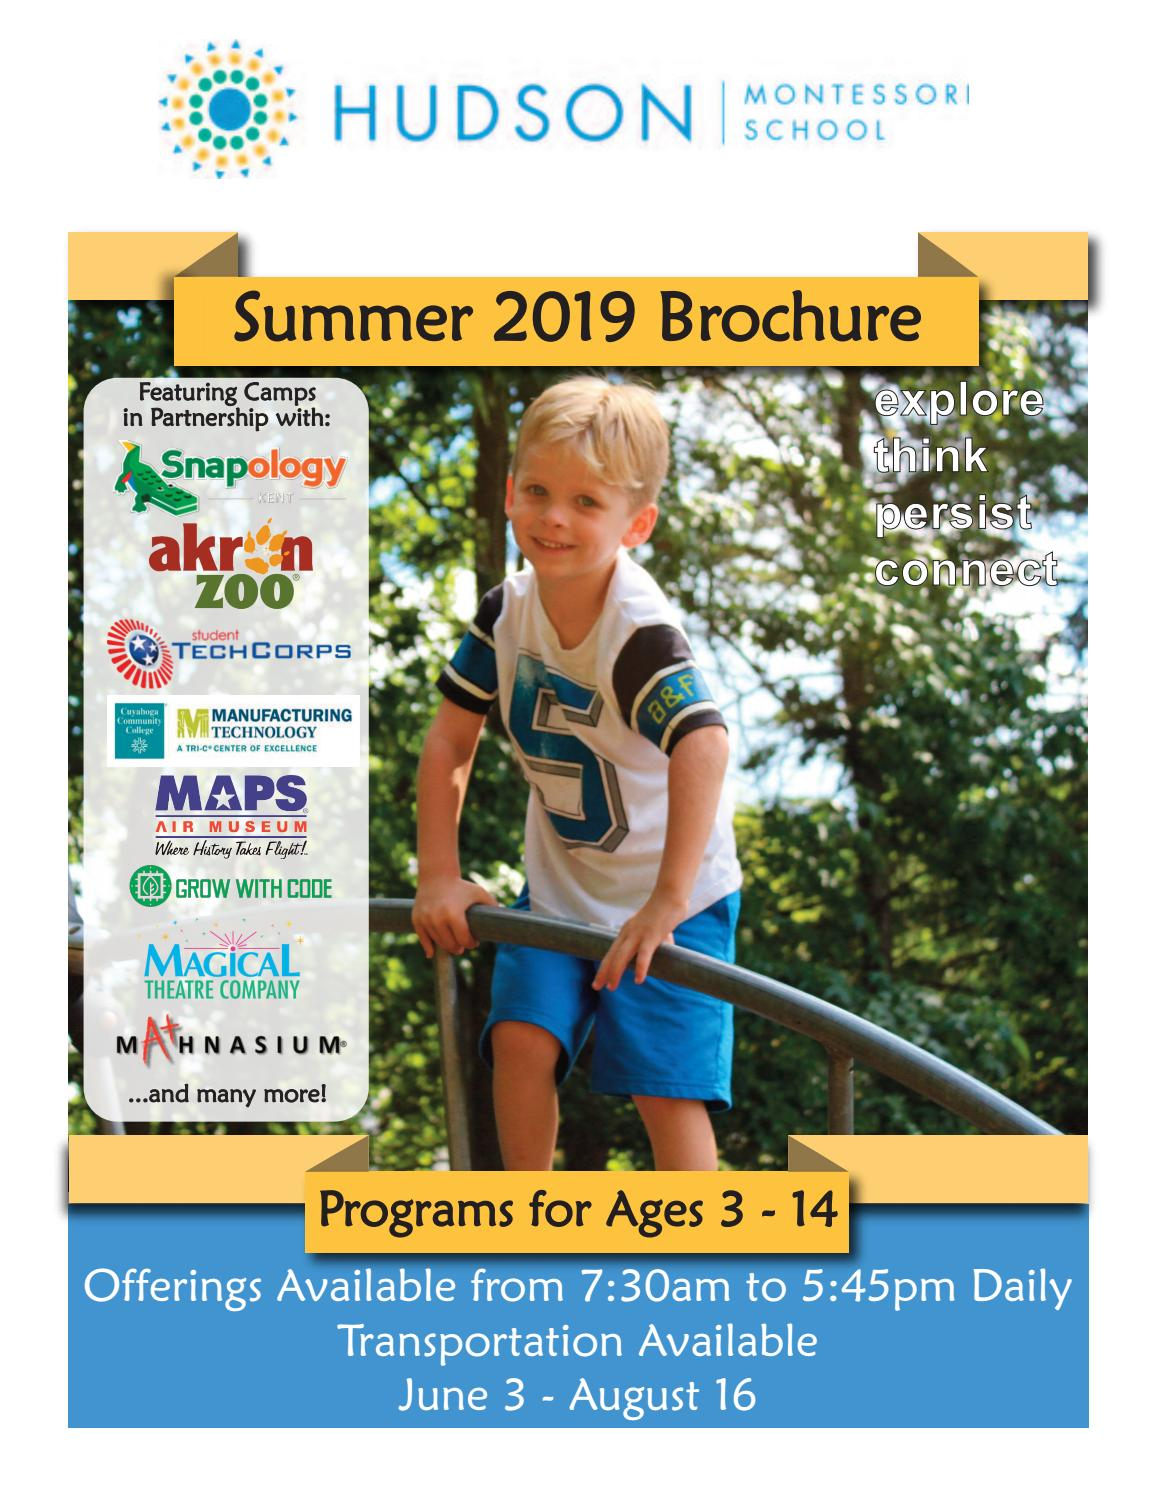 Hudson Montessori Summer Camp 2019 Brochure by Hudson